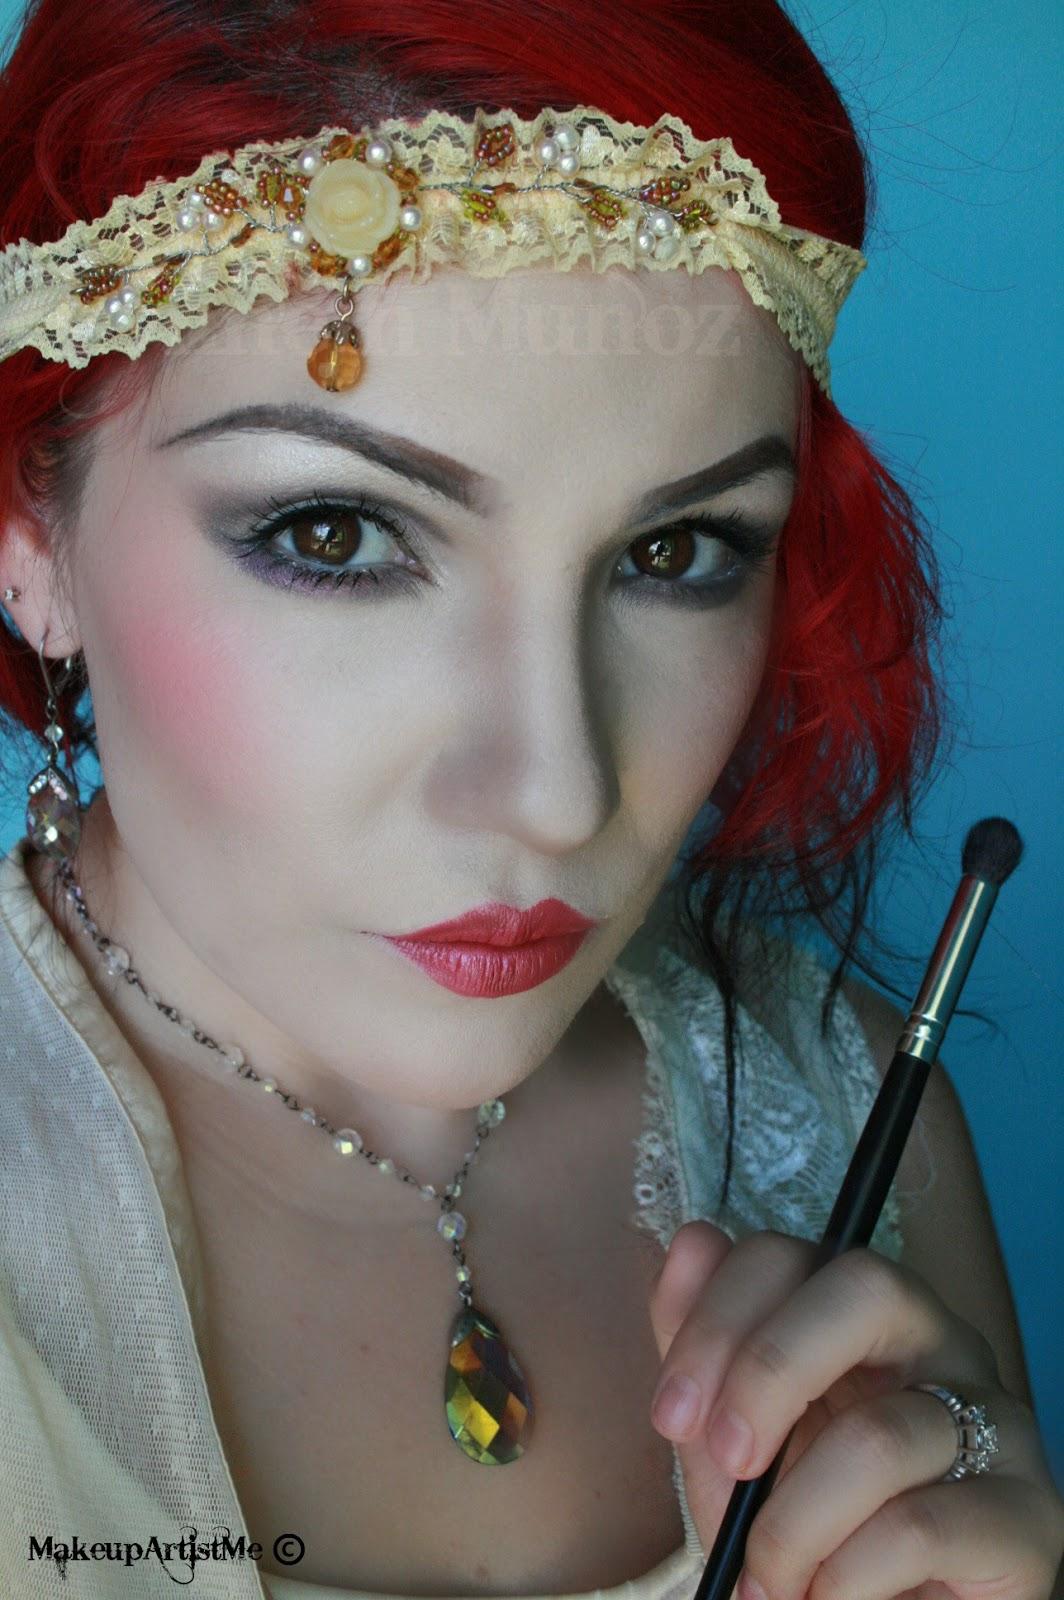 Makeup Artist Youtube: Make-up Artist Me!: 1920s Makeup